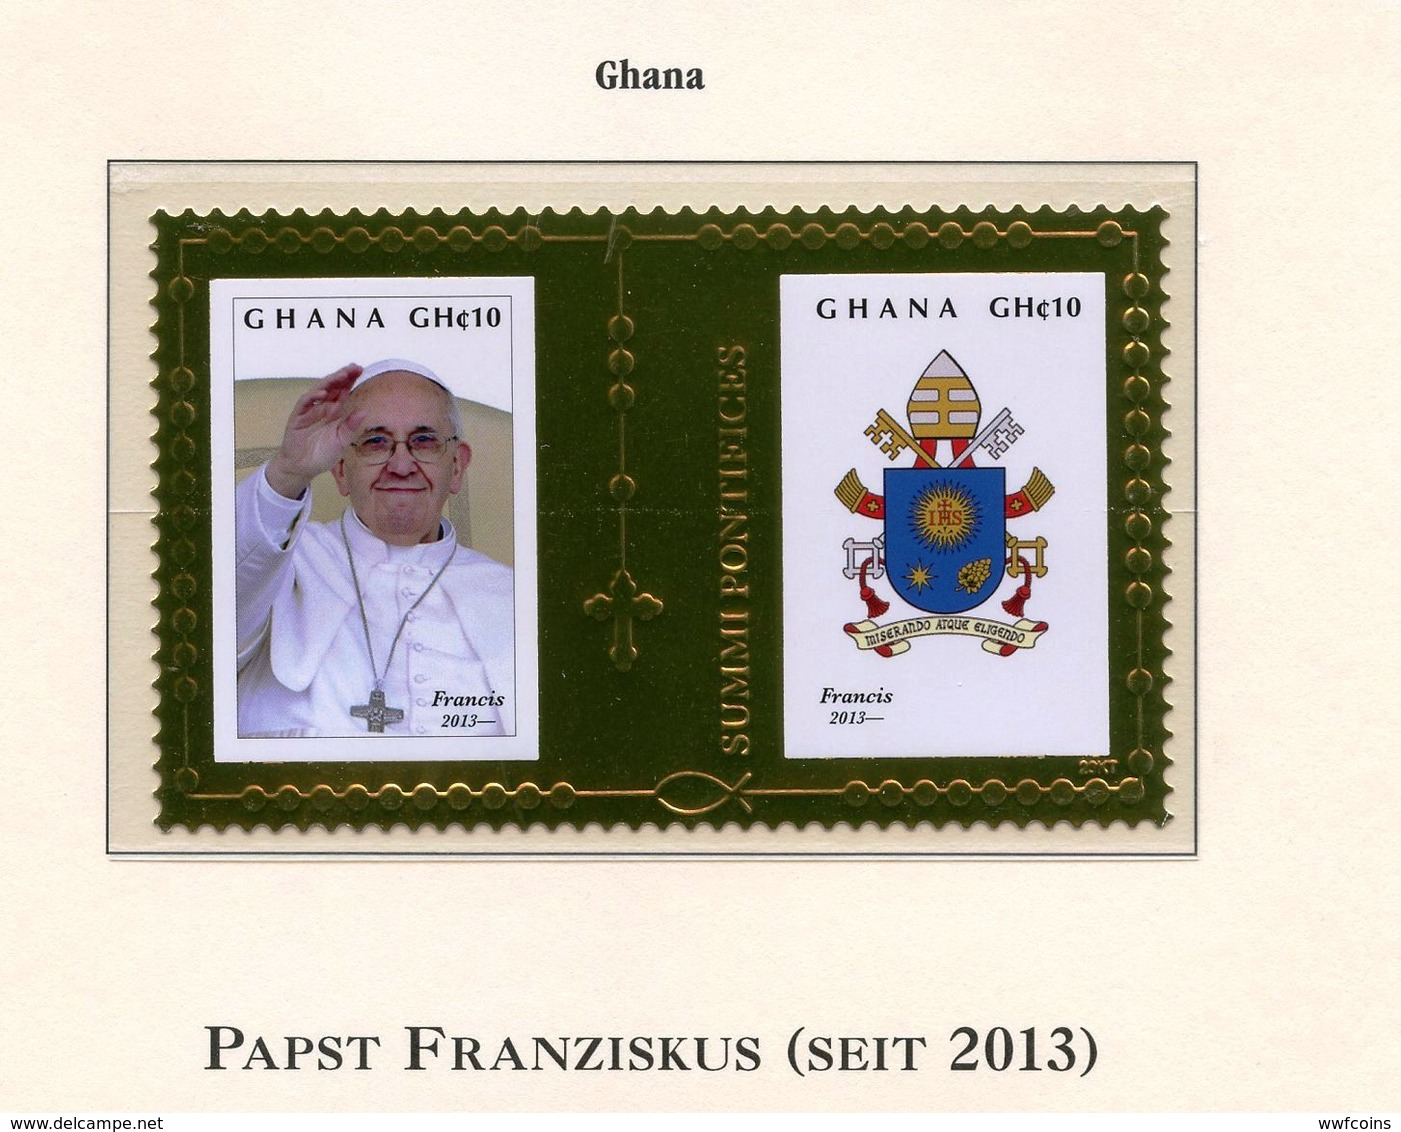 FRANCOBOLLI FOGLIETTI POSTAGE STAMP PAPA FRANCESCO PAPA GHANA 2013 DORATO POPE FRANZISKUS - Papi